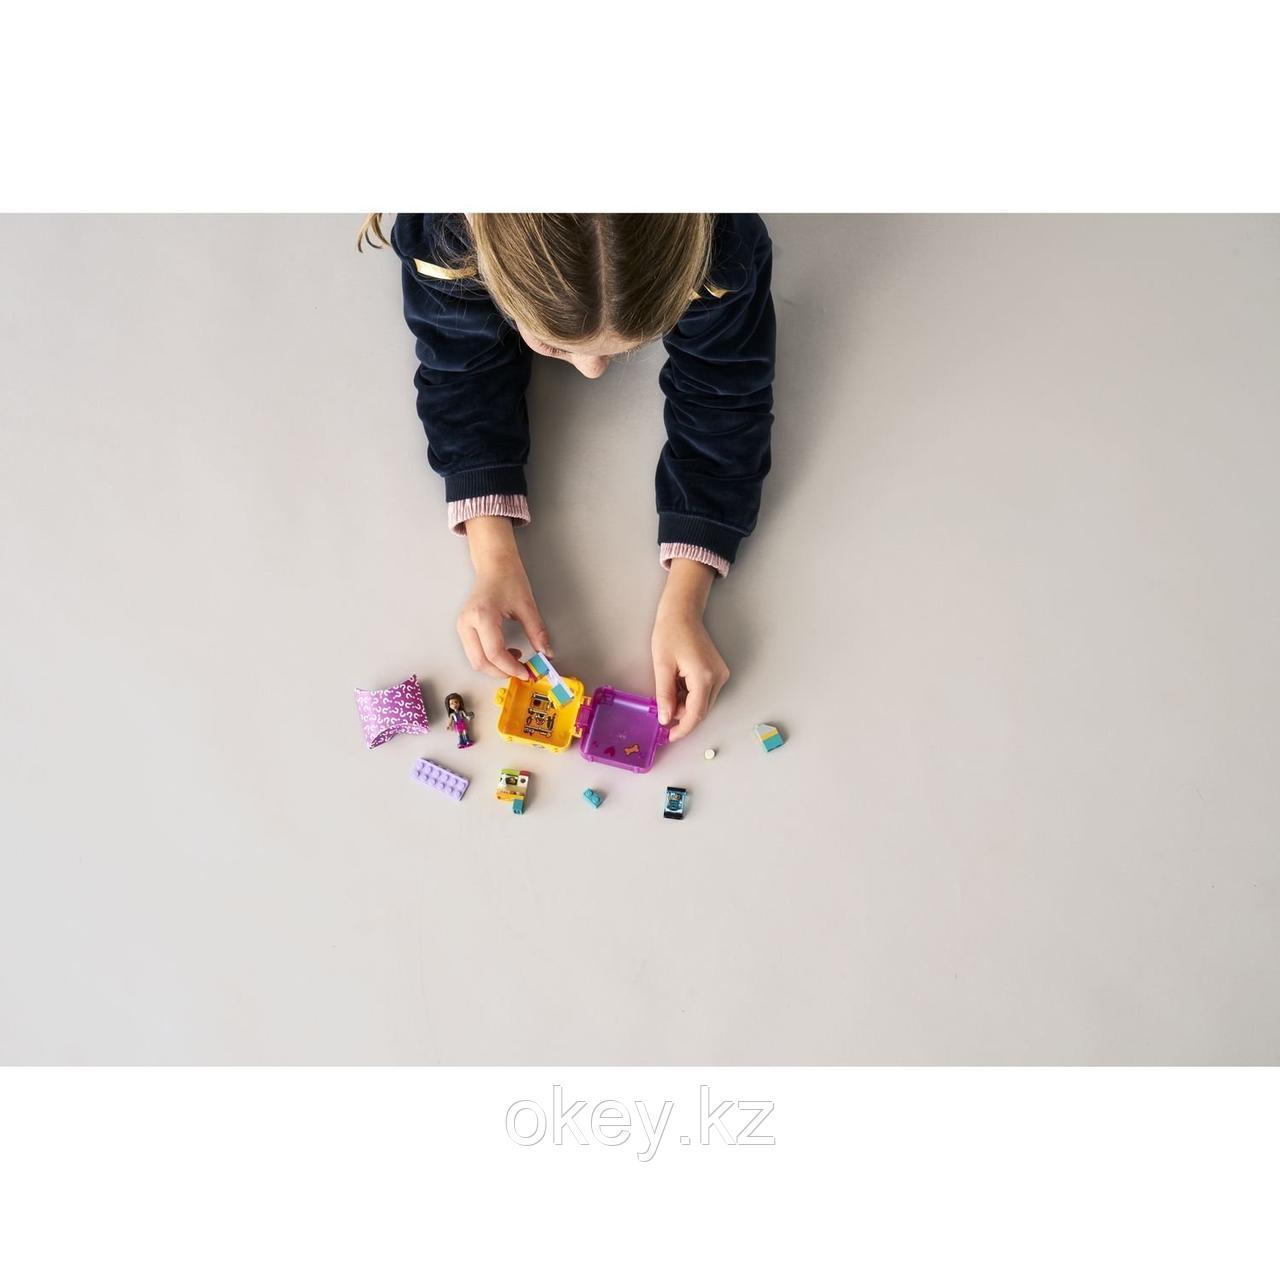 LEGO Friends: Игровая шкатулка Покупки Андреа 41405 - фото 6